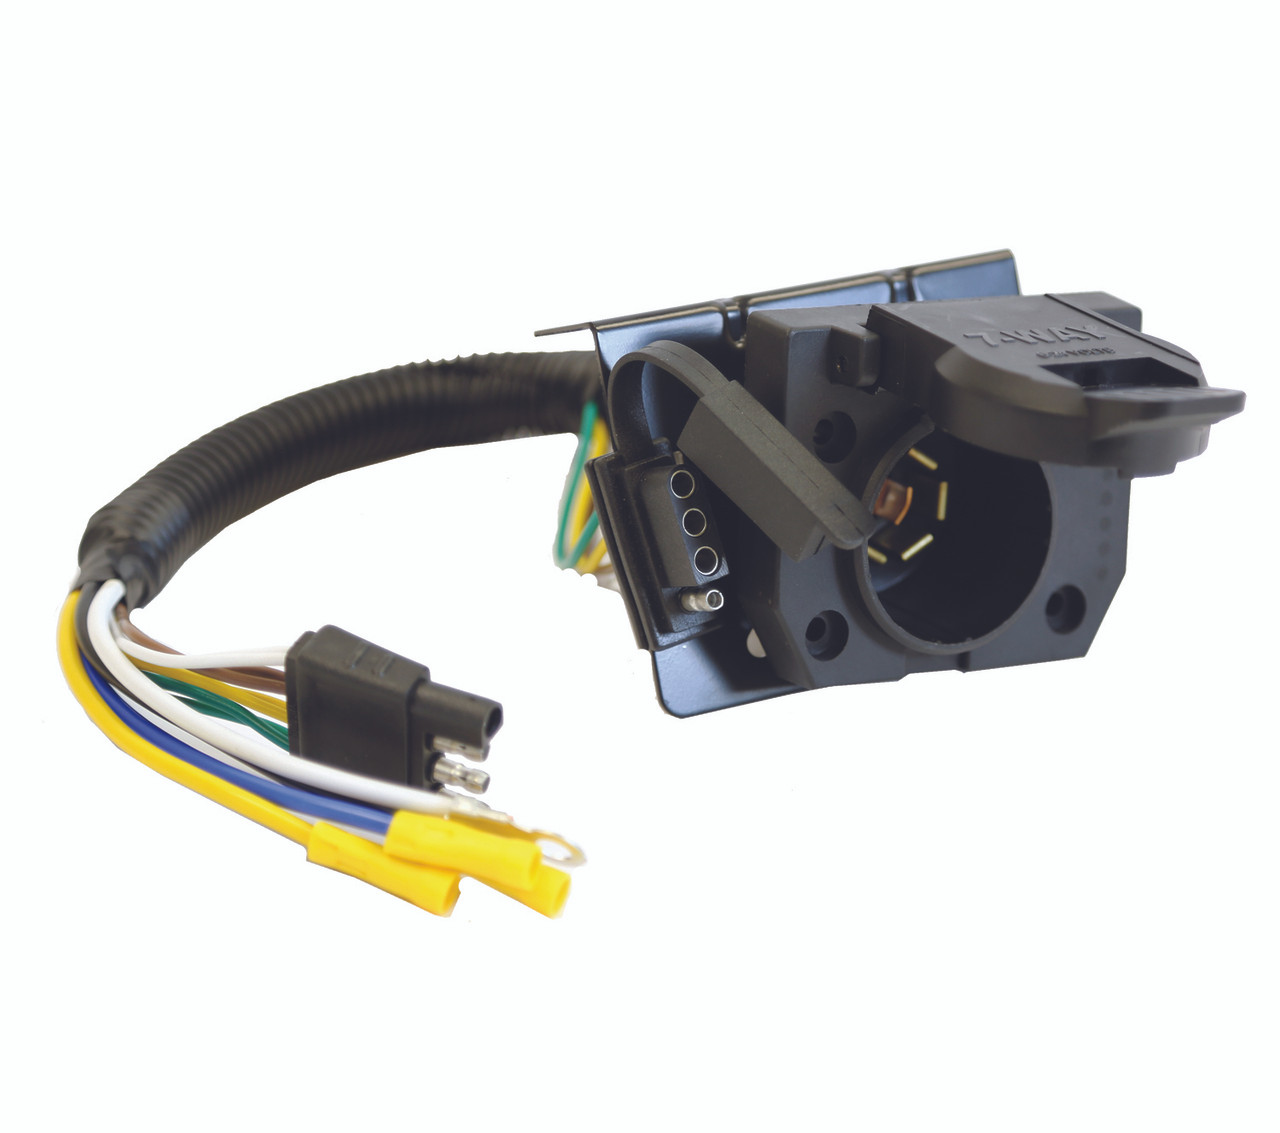 hight resolution of 37185 4 prong flat to 4 prong flat and 7 way flat pin adapter croft trailer supply